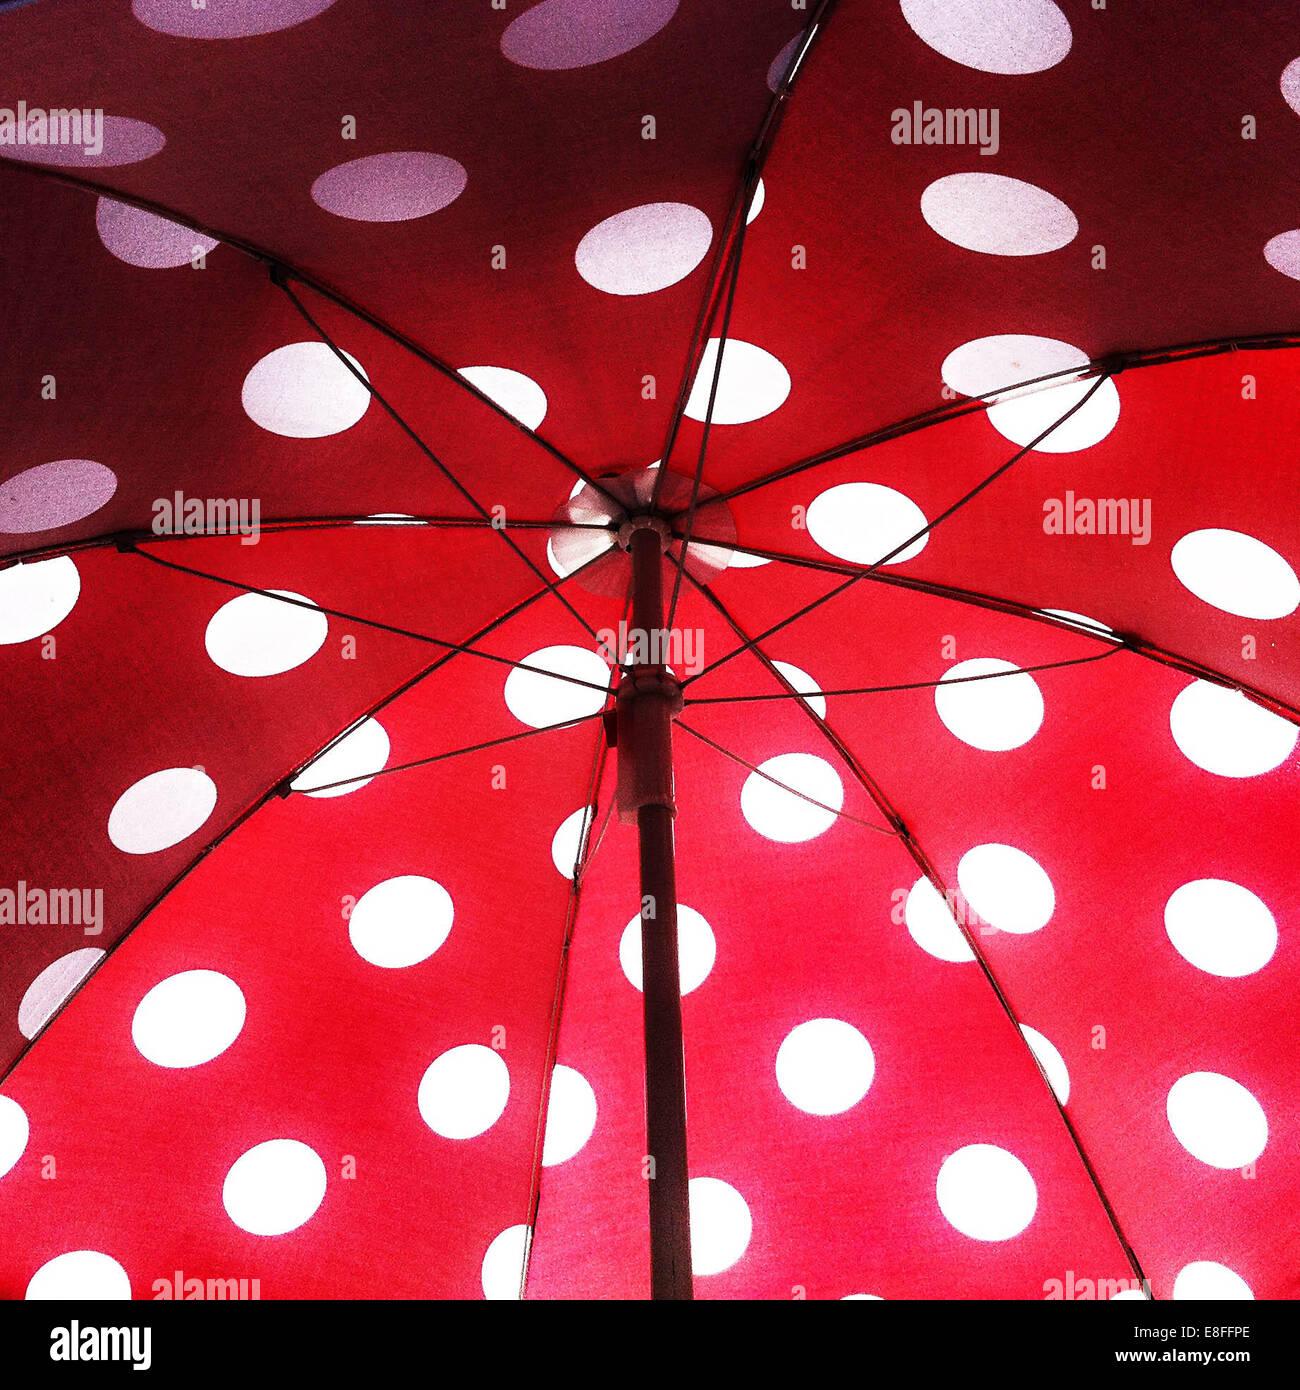 Offenes Dach mit Polka Dot Muster Stockbild